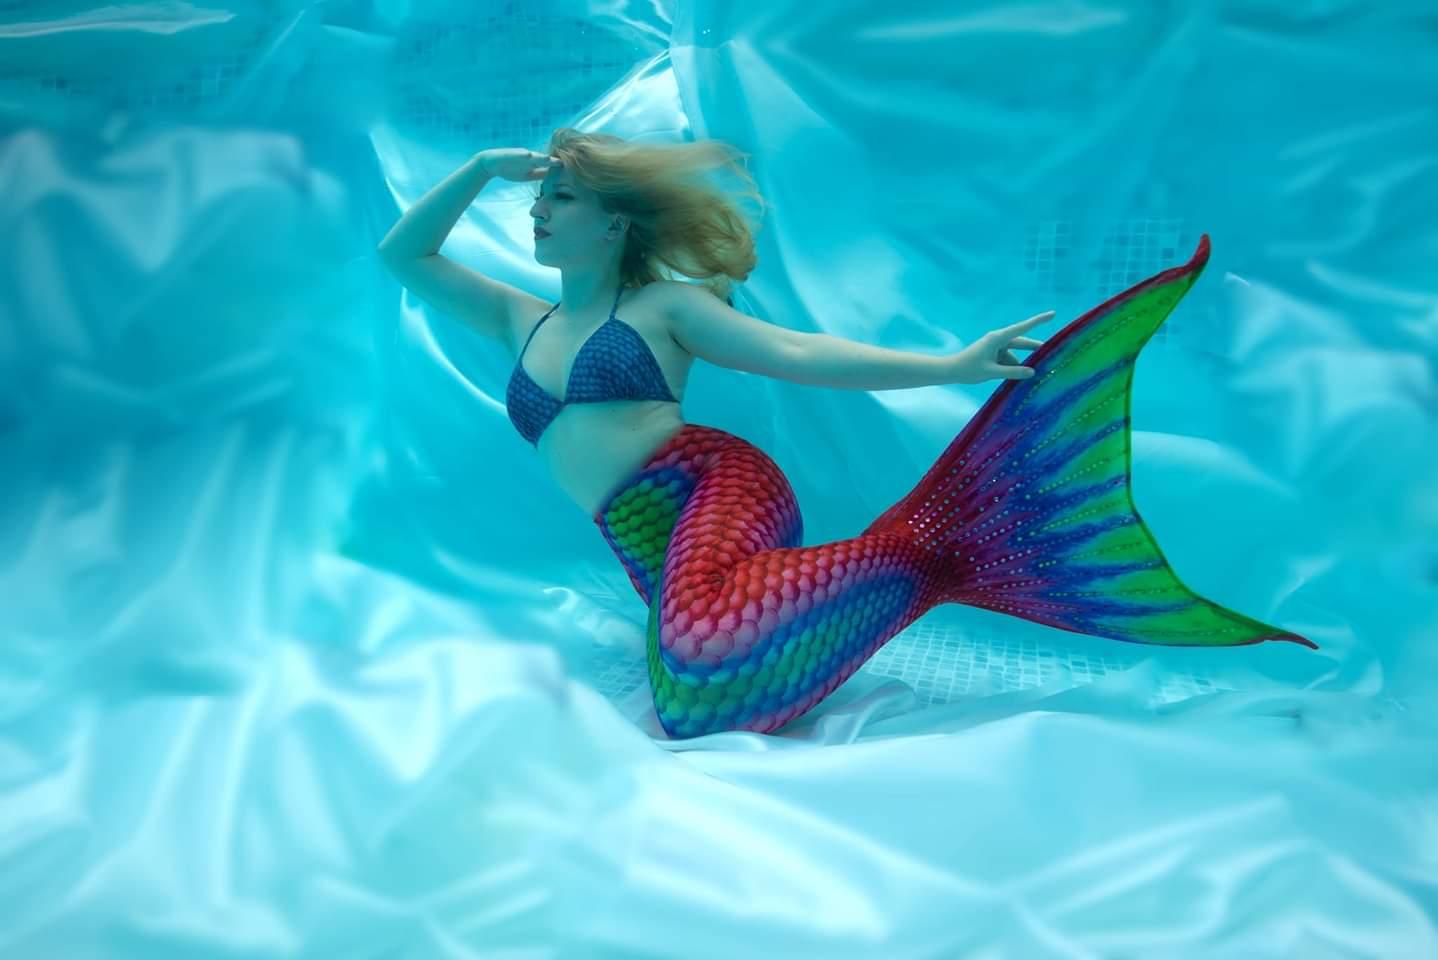 Mermaid Camp - Hire A Mermaid